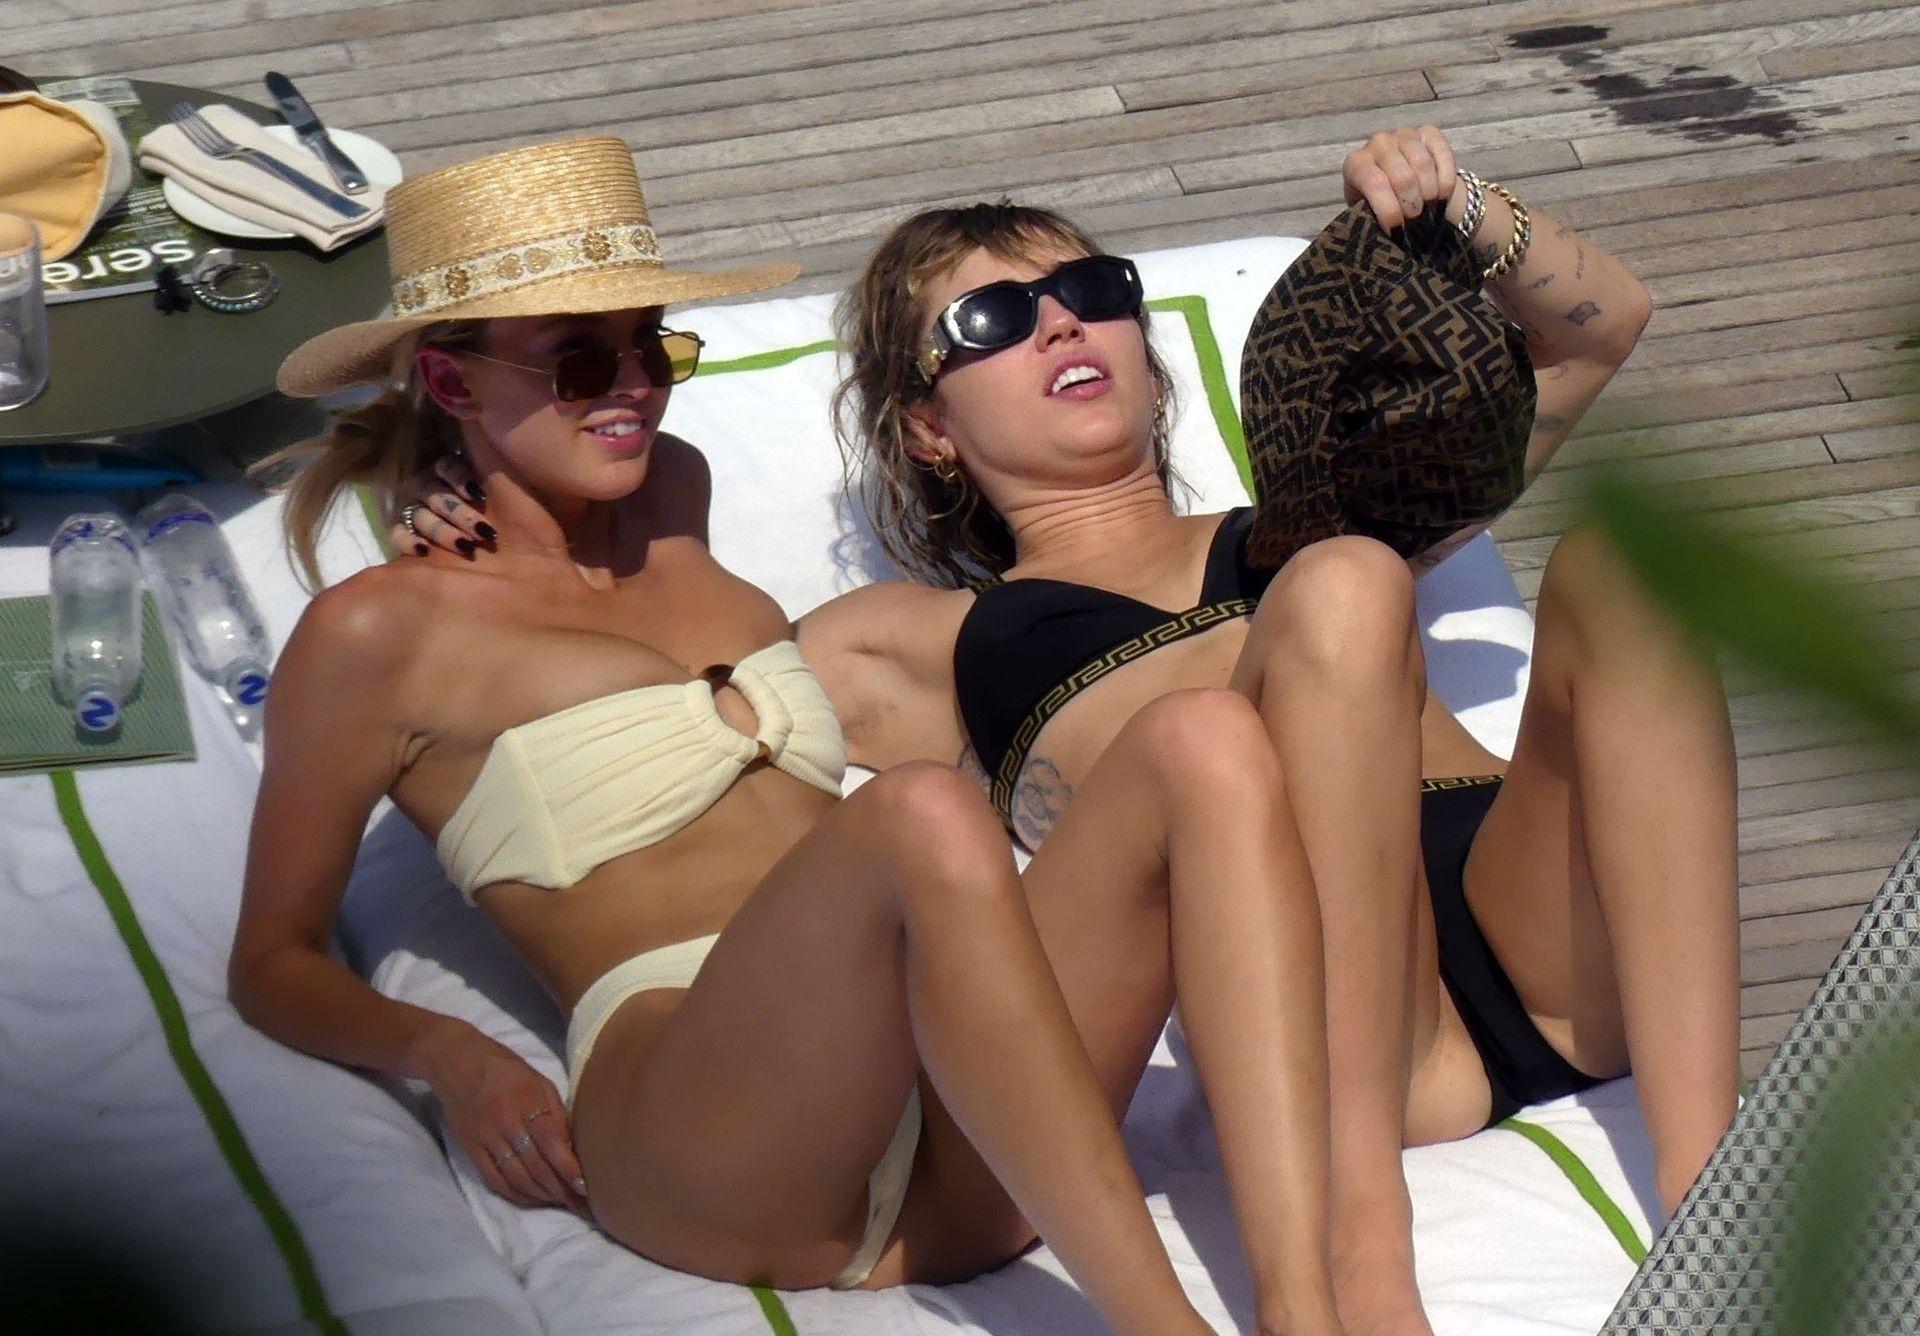 0713004446900_48_Miley-Cyrus-Topless-Kaitlynn-Carter-Hot-TheFappeningBlog.com-48.jpg